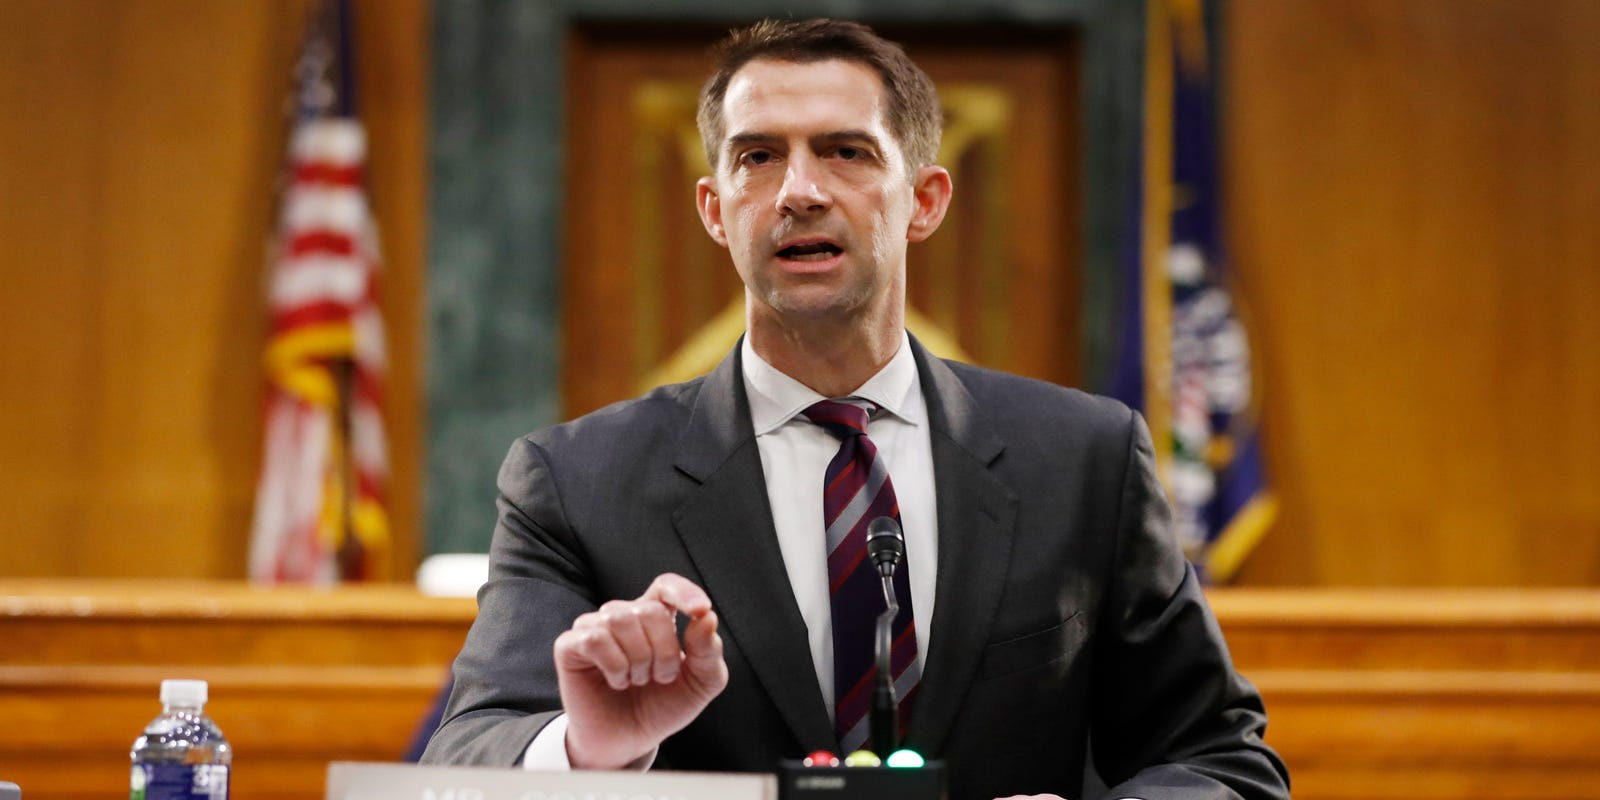 Sen. Tom Cotton faces massive criticism for necessary evil of slavery remarks